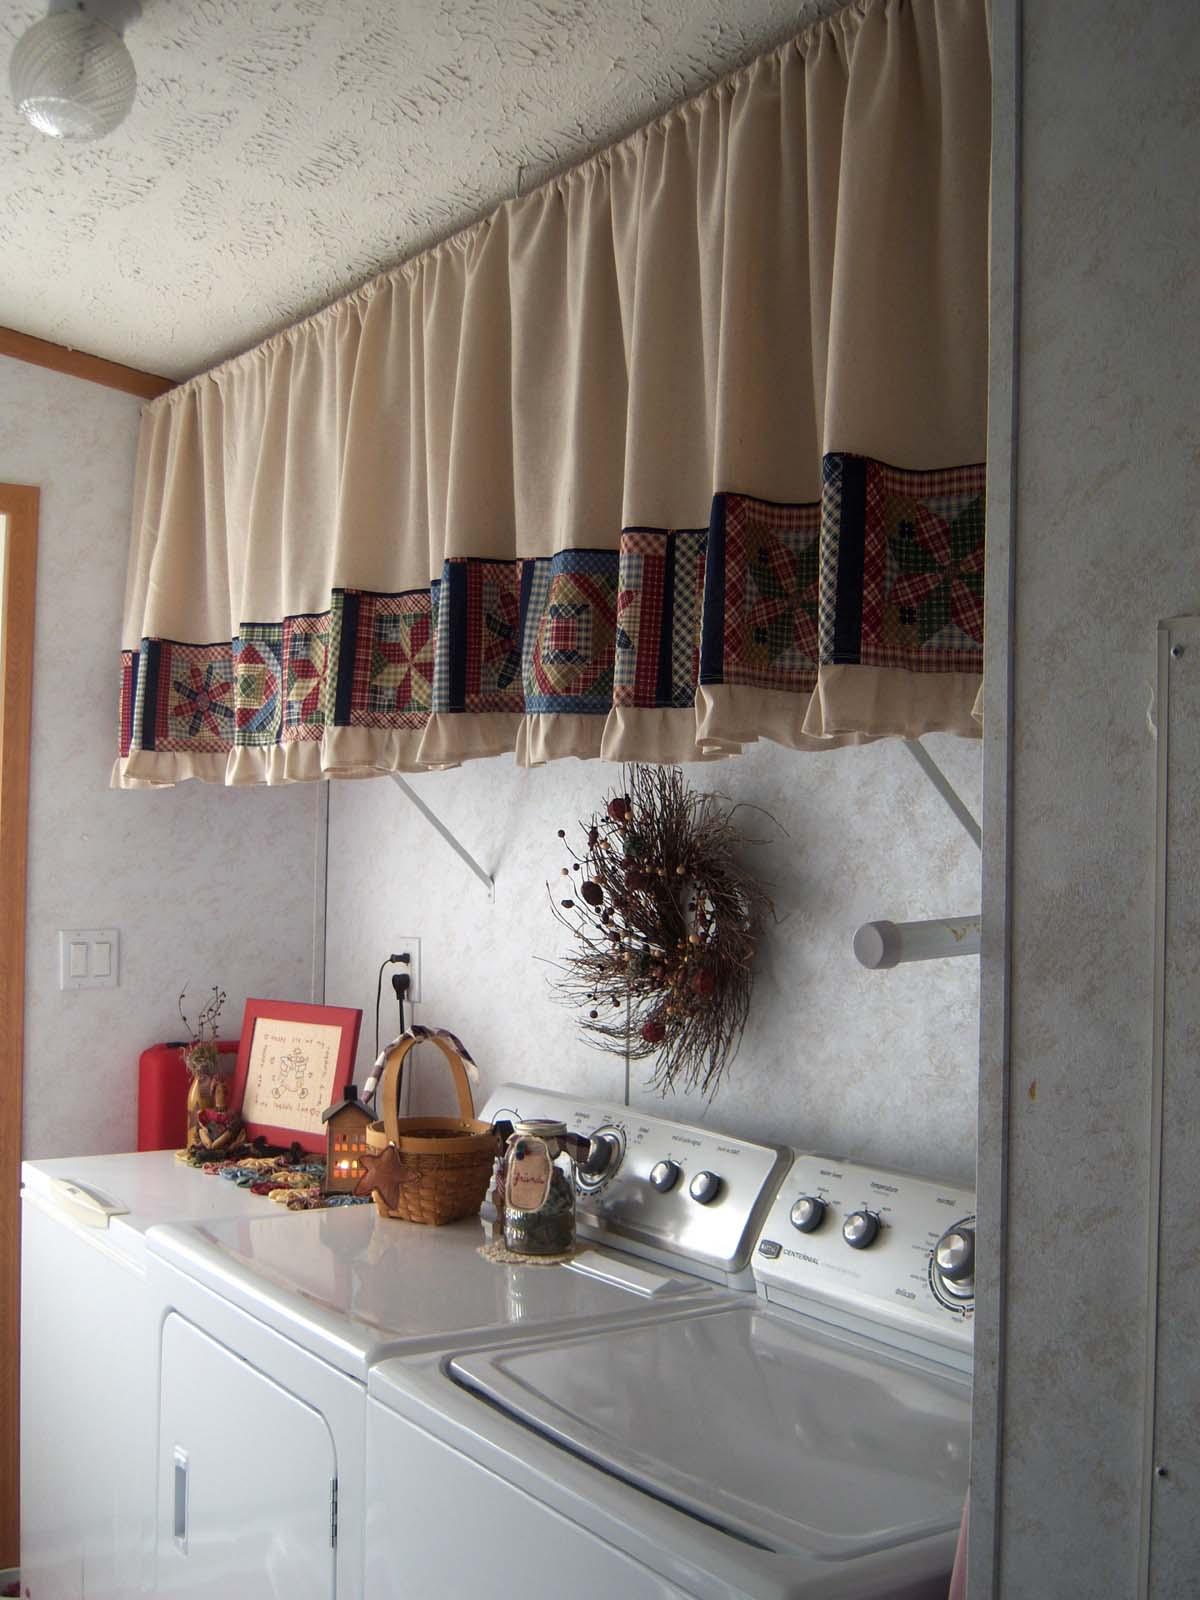 Shoregirl s Creations Laundry Room Makeover